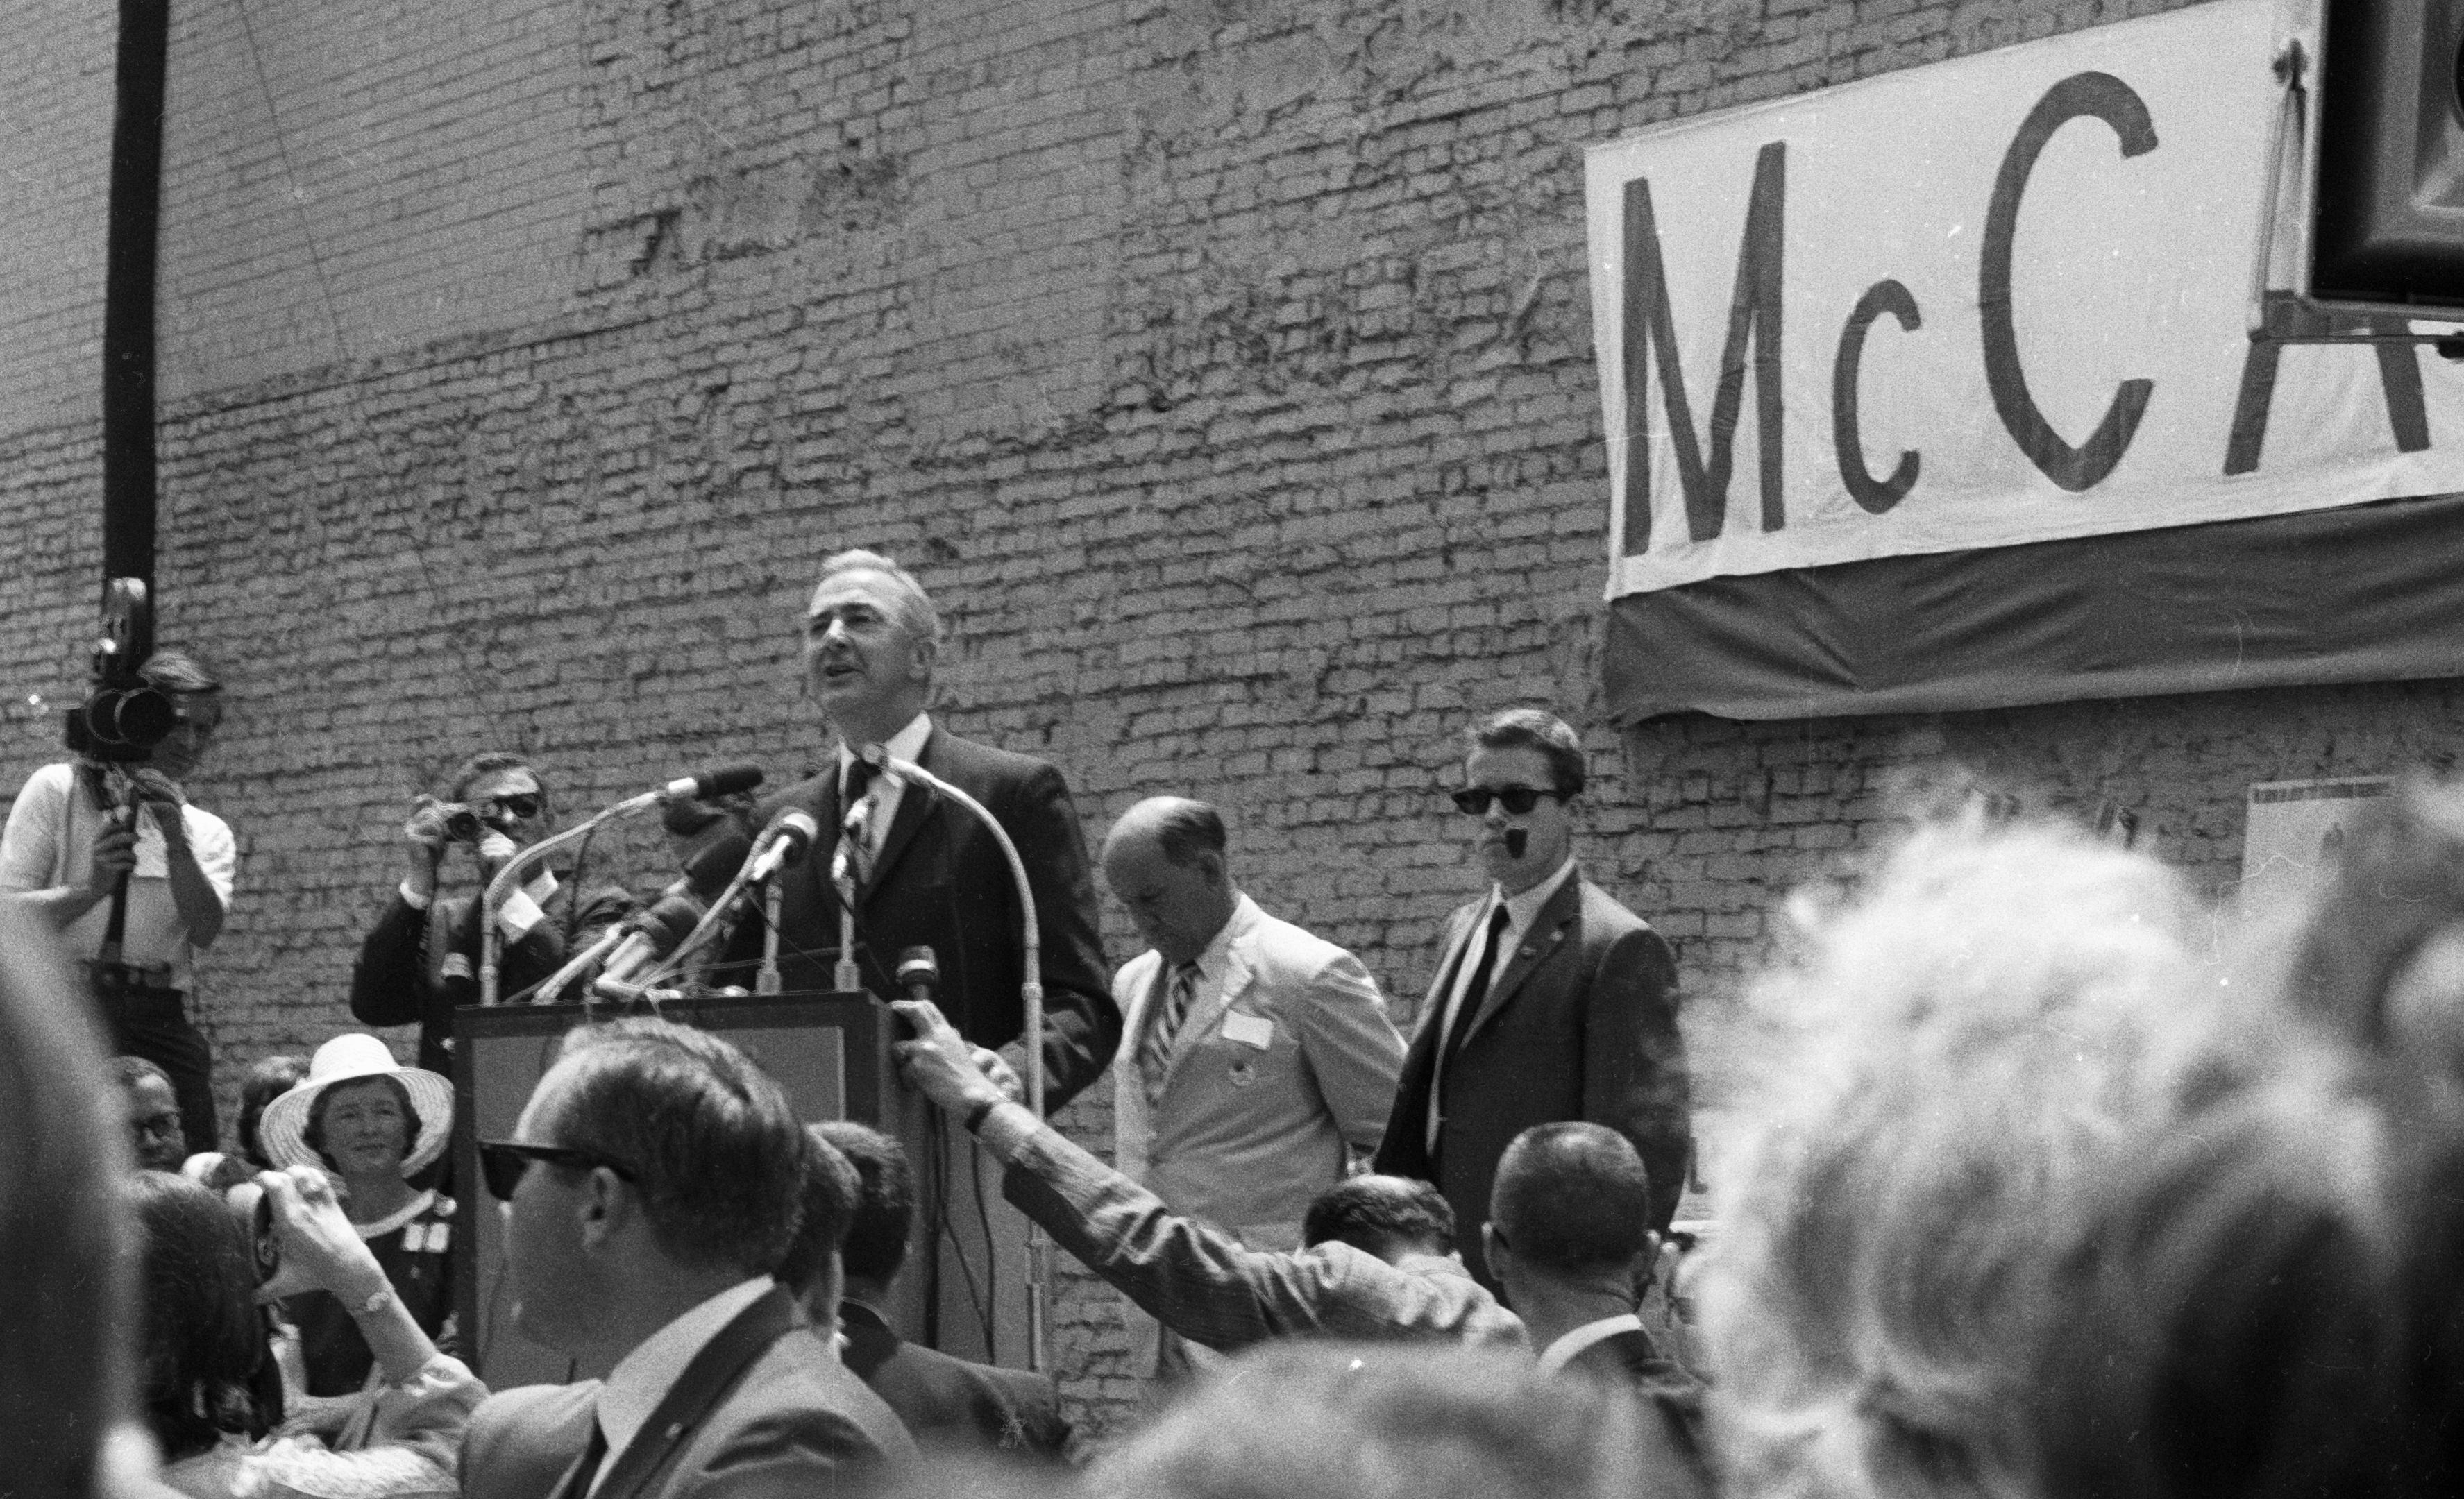 1940-49 Punctual 1968 Democrats Humphrey Mccarthy Magazine Front Page Advertisement Ad